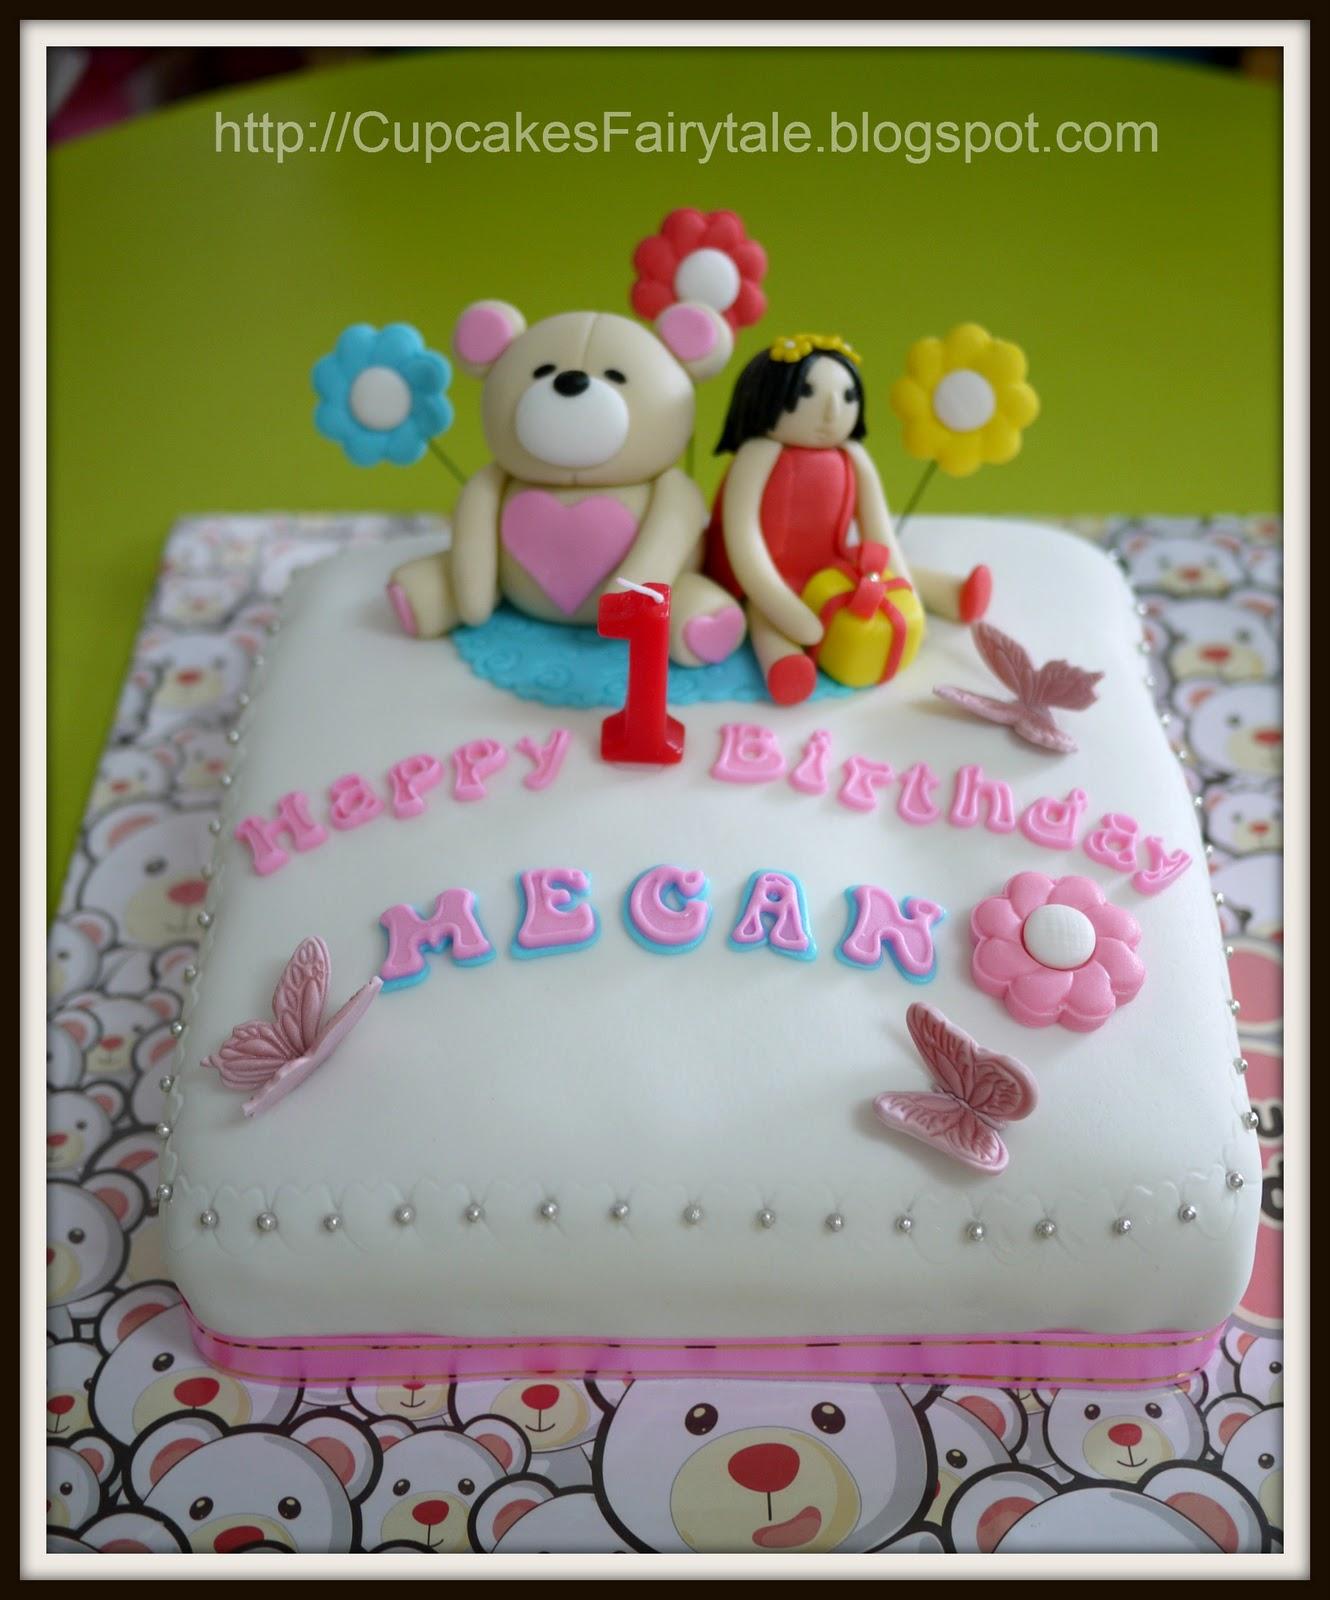 Cupcakes Fairytale Megan Tays 1st Birthday Cake